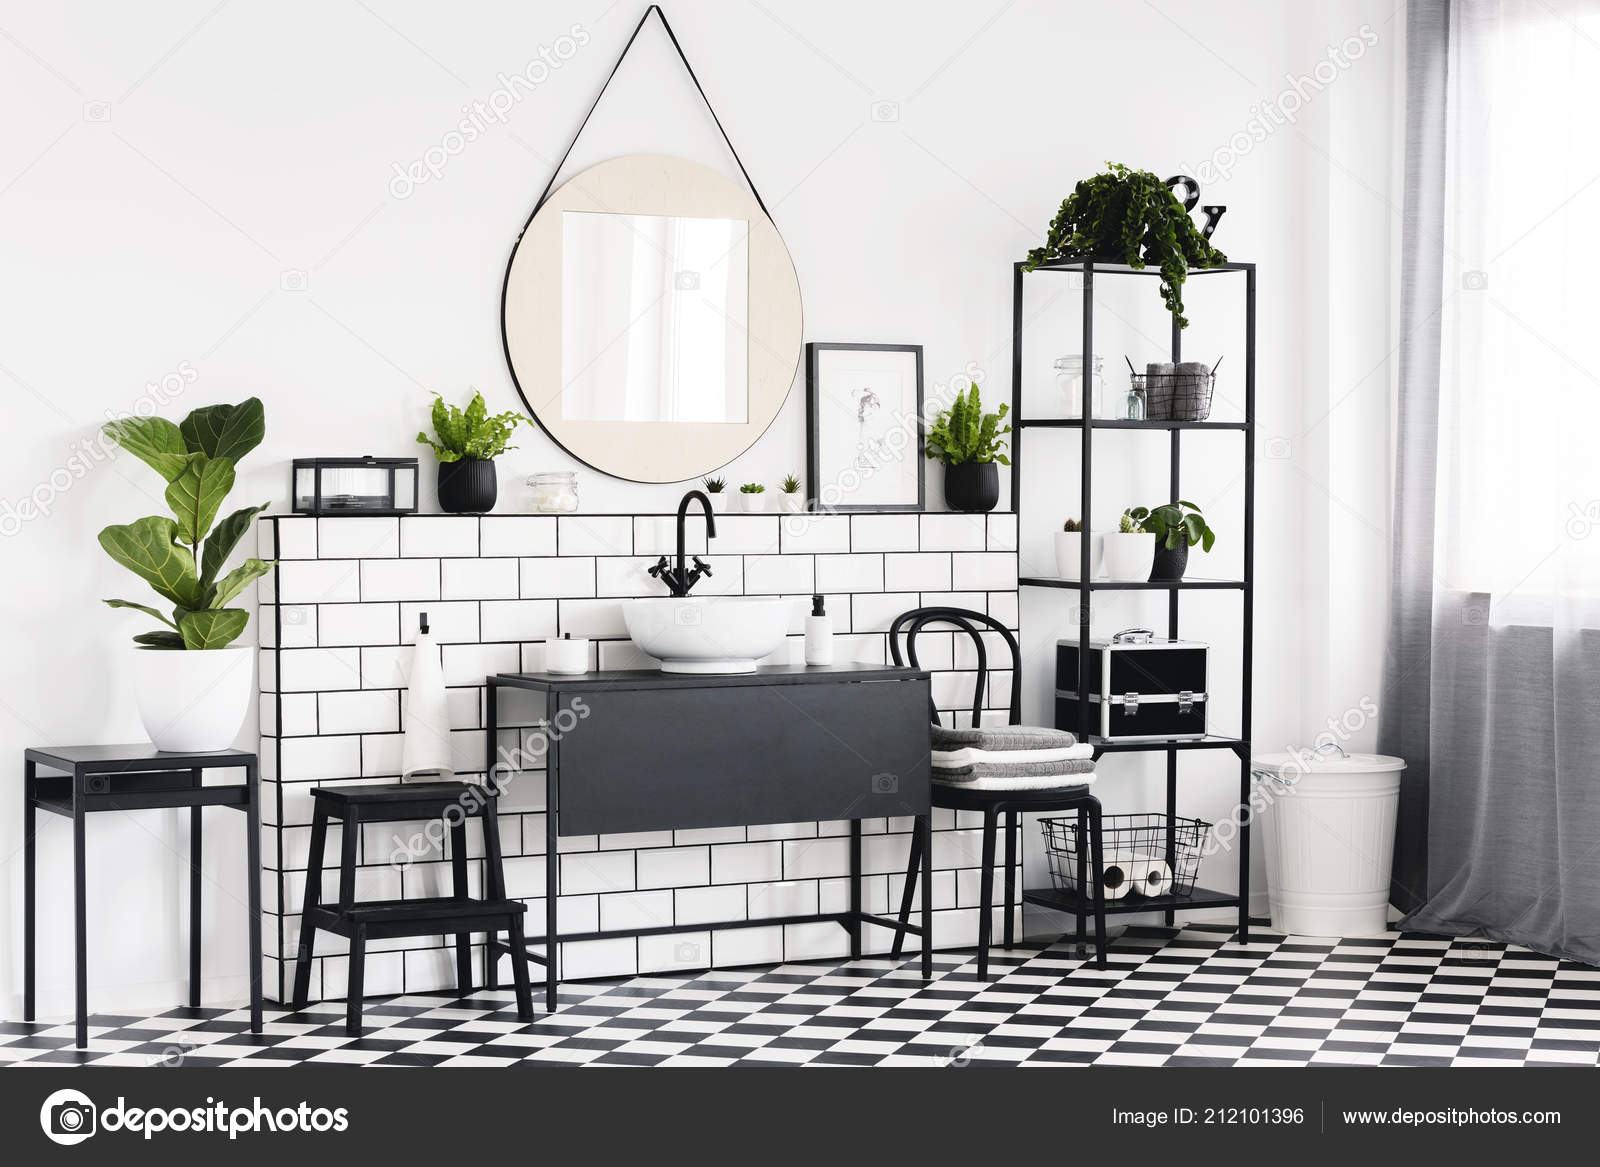 Photo De Salle De Bain Noir Et Blanc plant table black white bathroom interior checkered floor